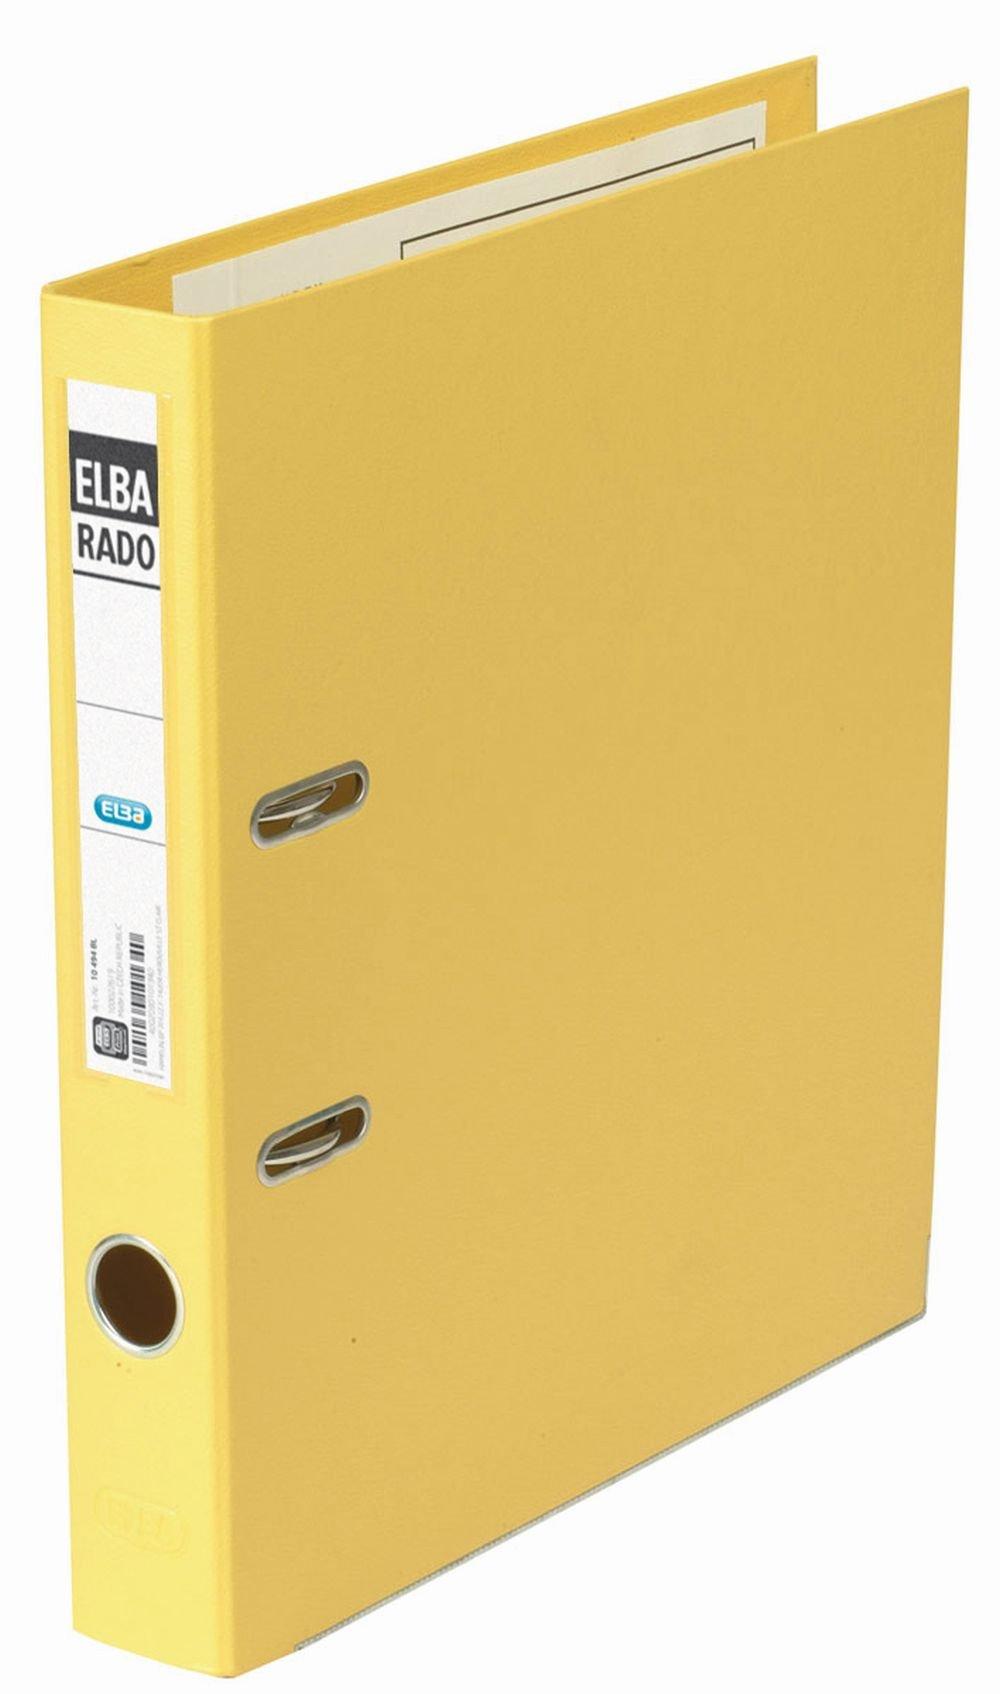 Elba 10494GB Folder Plastic A4 Width 50 mm Yellow